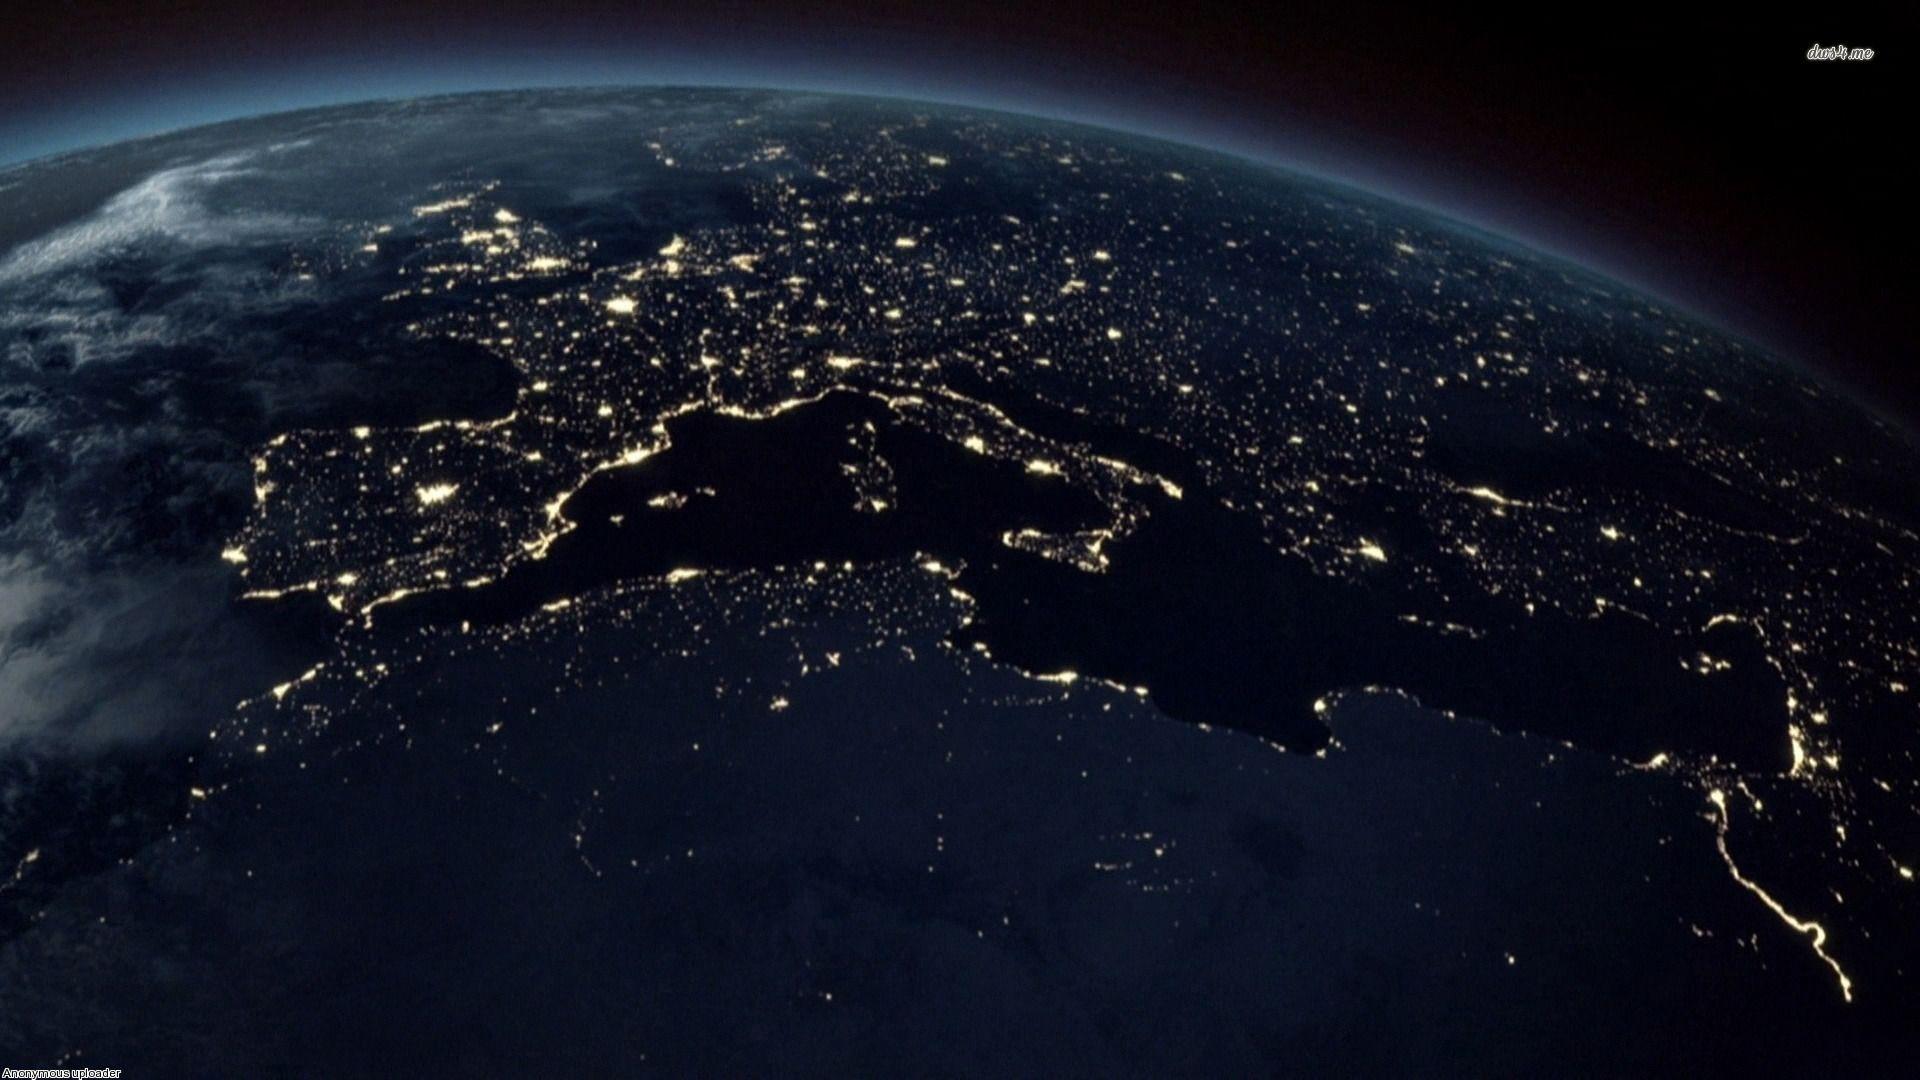 hd wallpaper cool earth backgroundscool at night desktop background ortevmgt